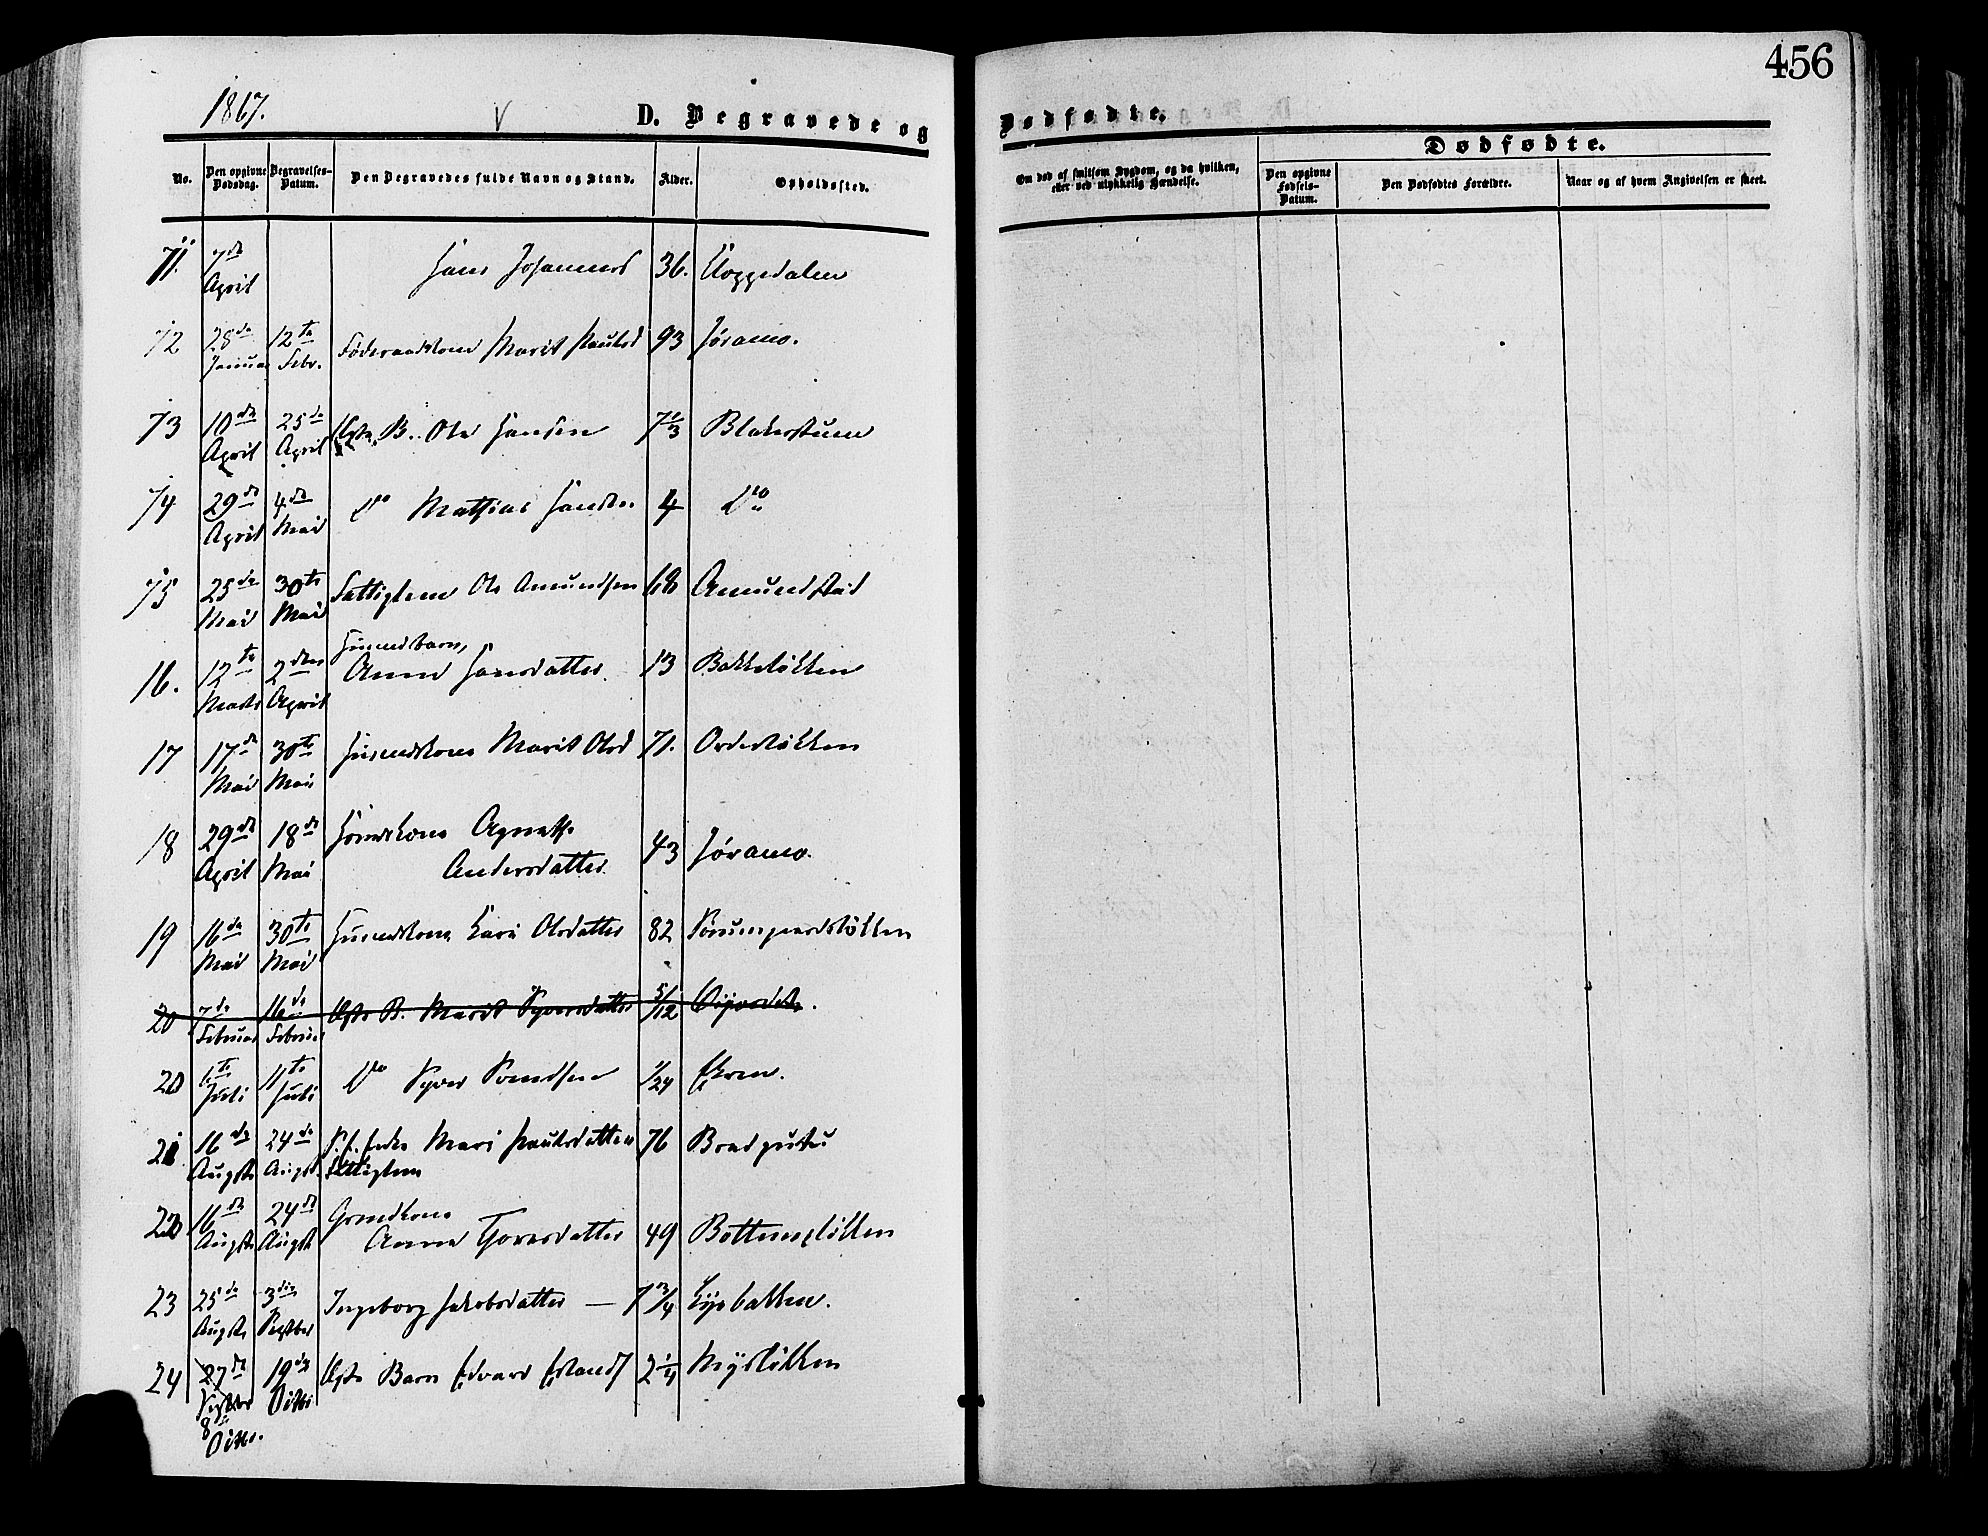 SAH, Lesja prestekontor, Ministerialbok nr. 8, 1854-1880, s. 456